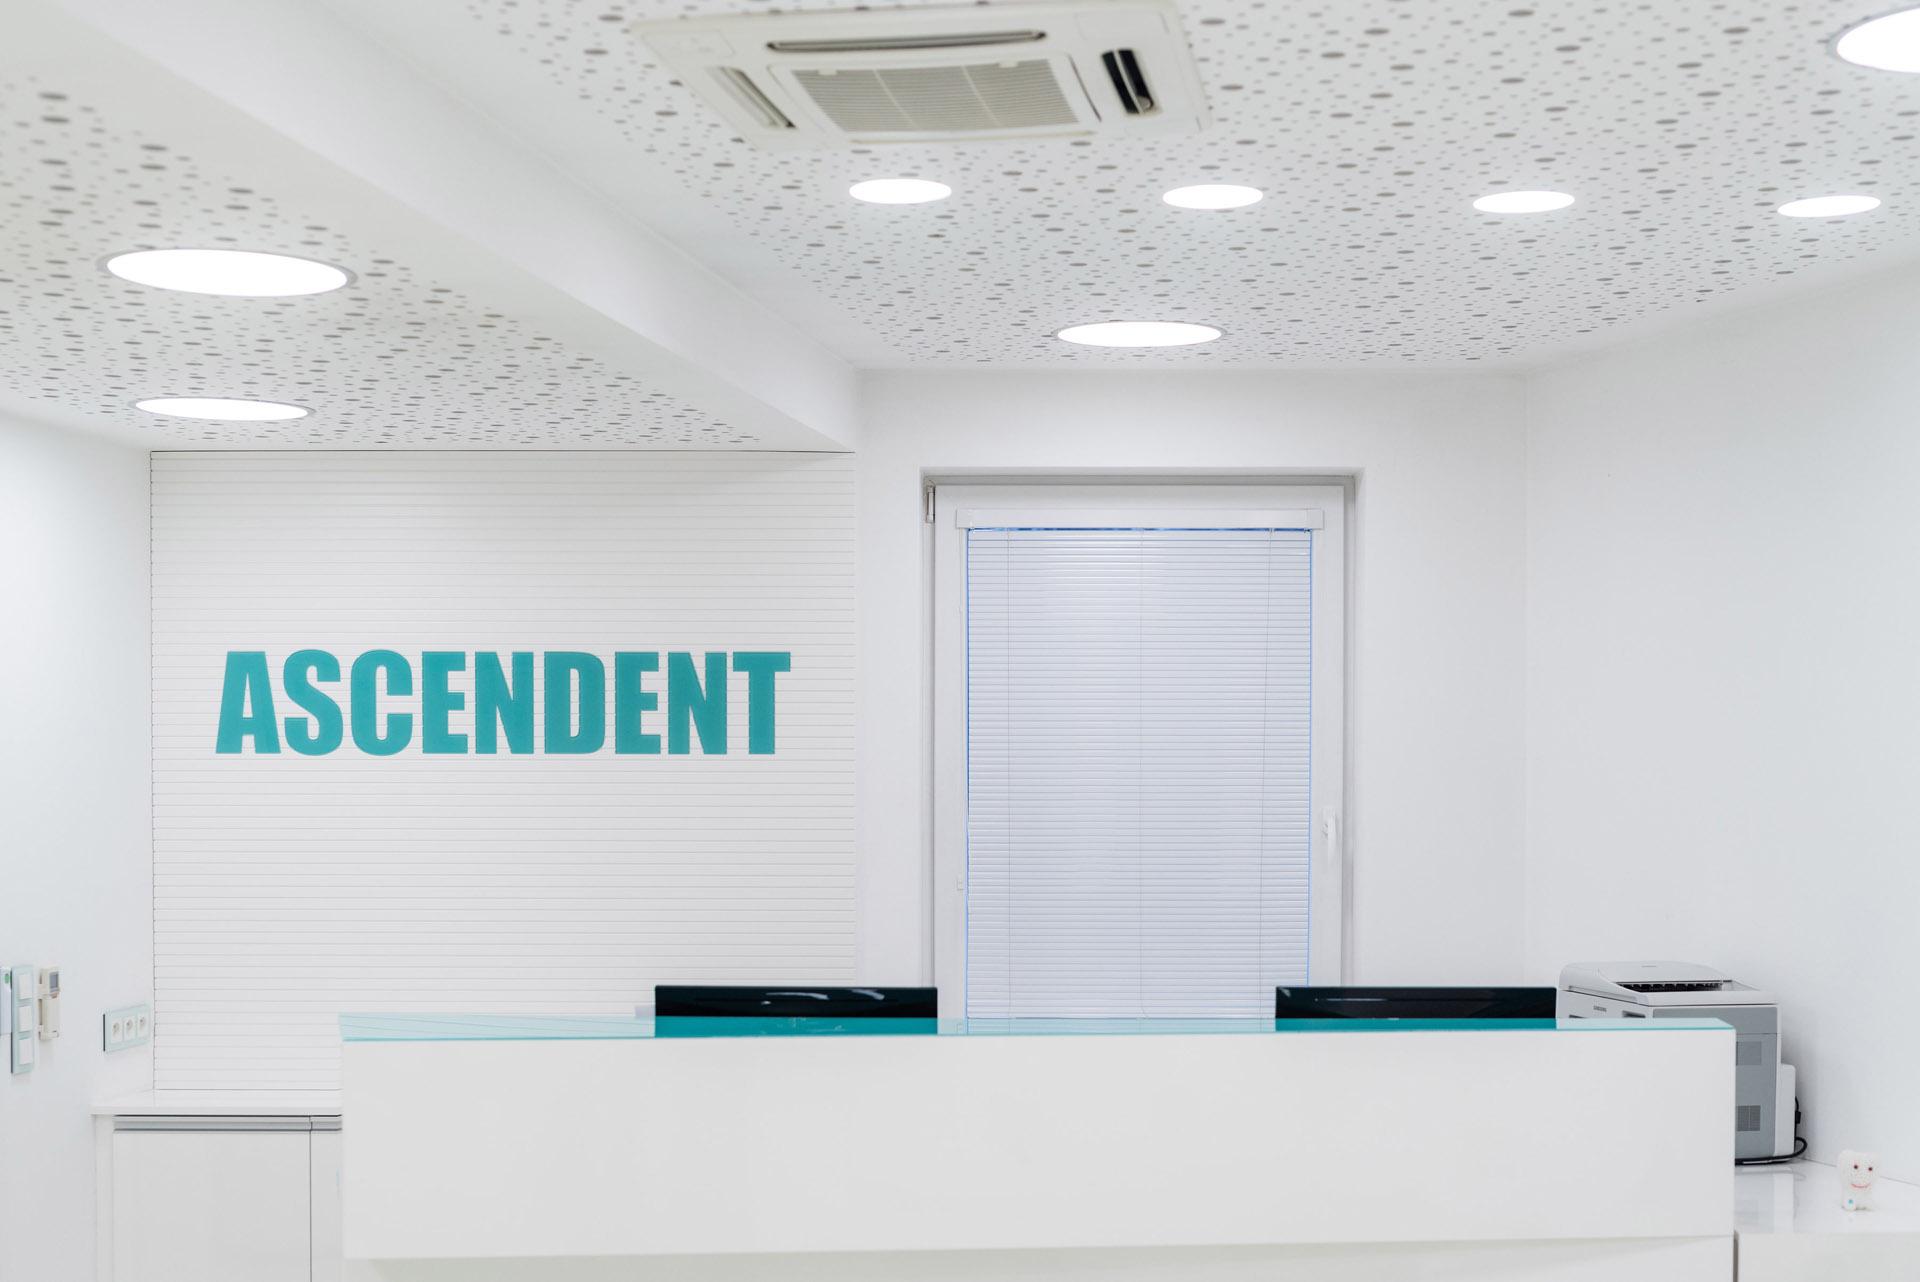 Zubni klinika Ascendet, Foto: Jiri Hlousek